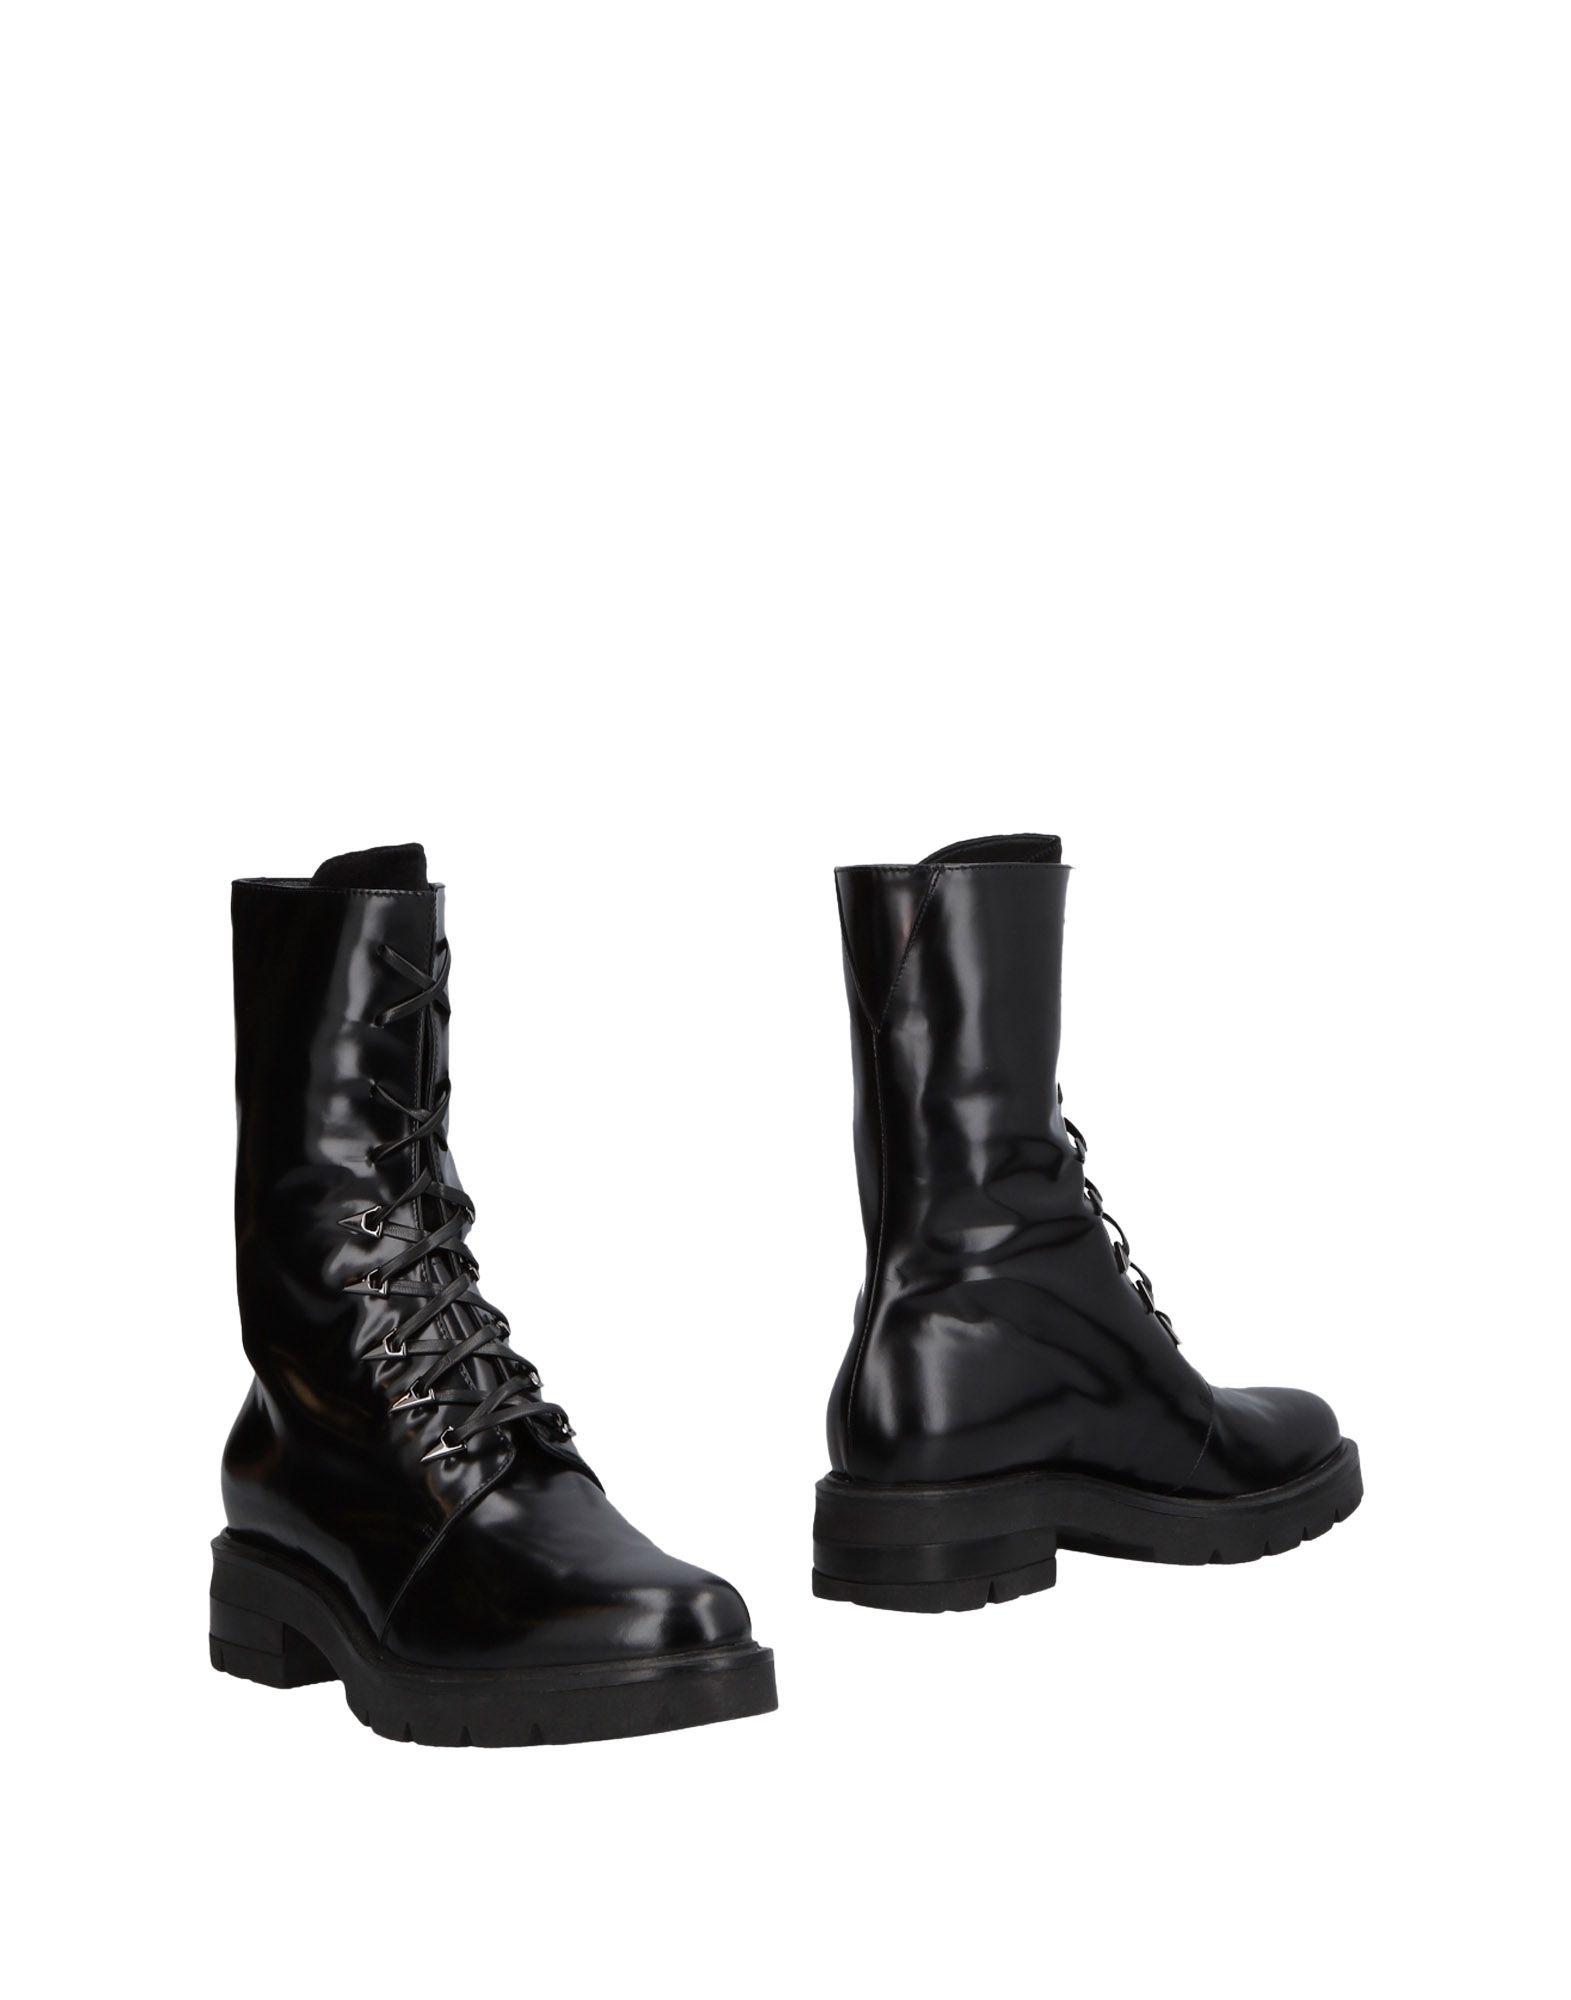 LAMPERTI MILANO Ankle Boots in Black